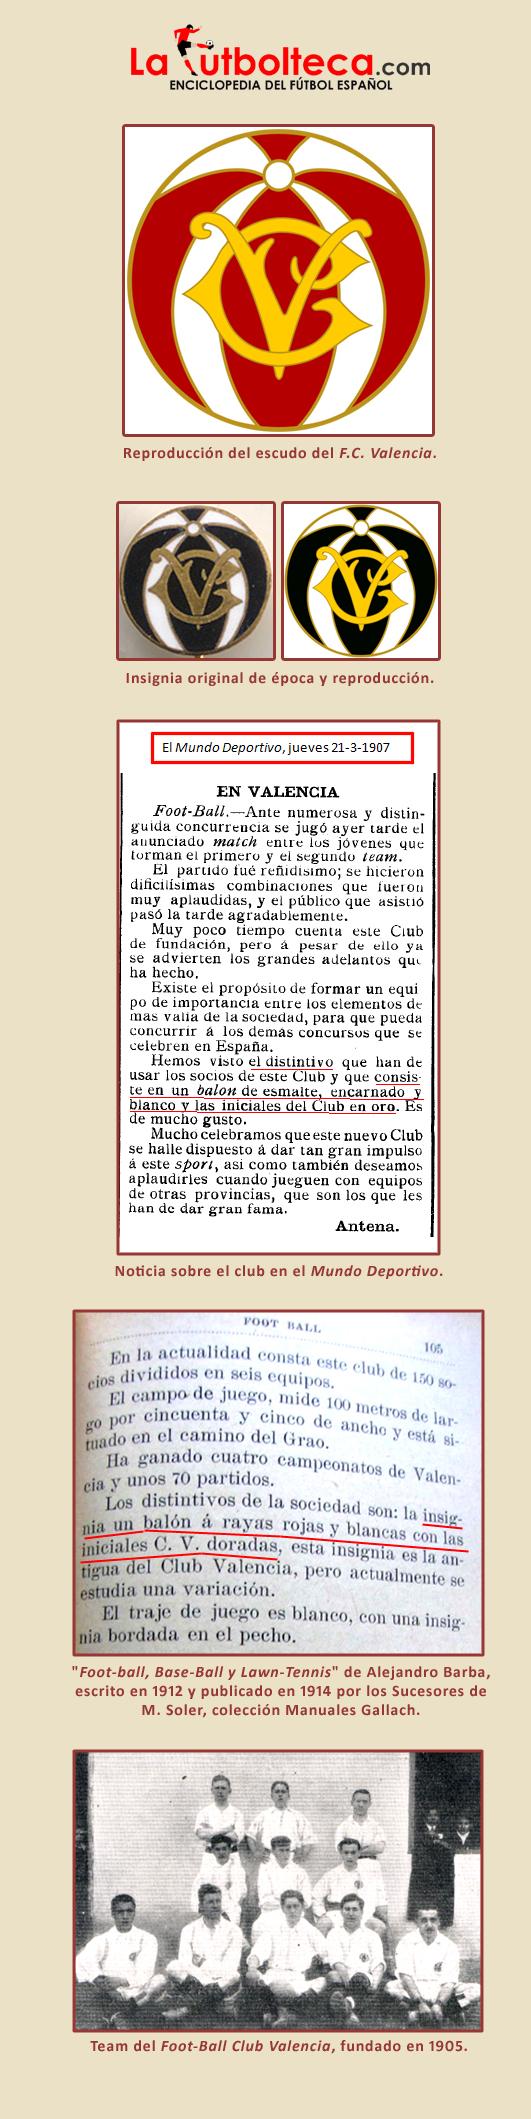 Album Escudos insignia FC Valencia